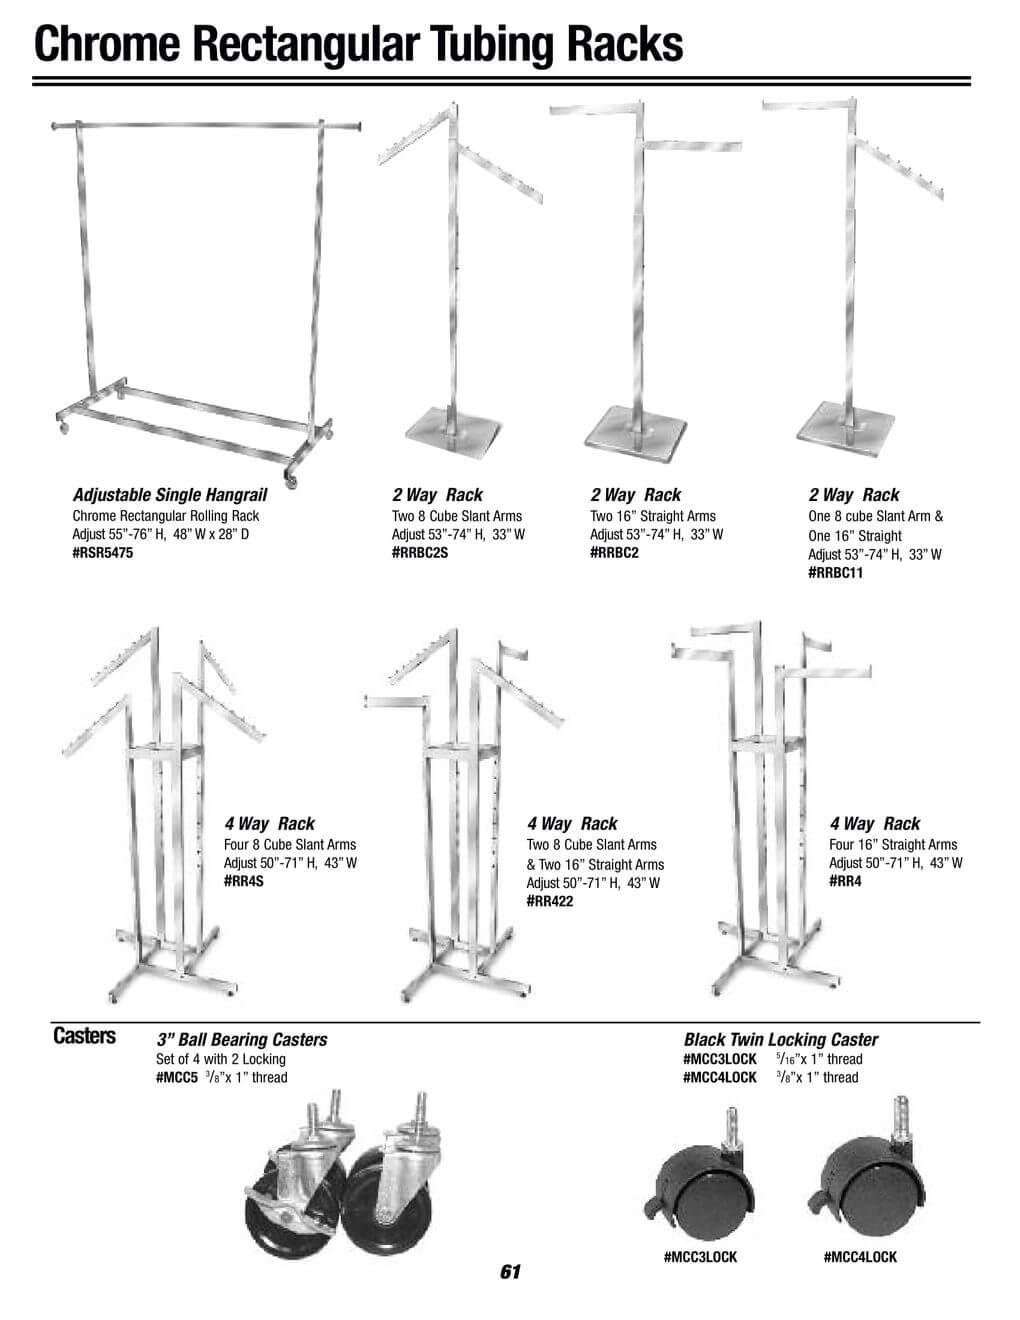 chrome rectangular tubing racks